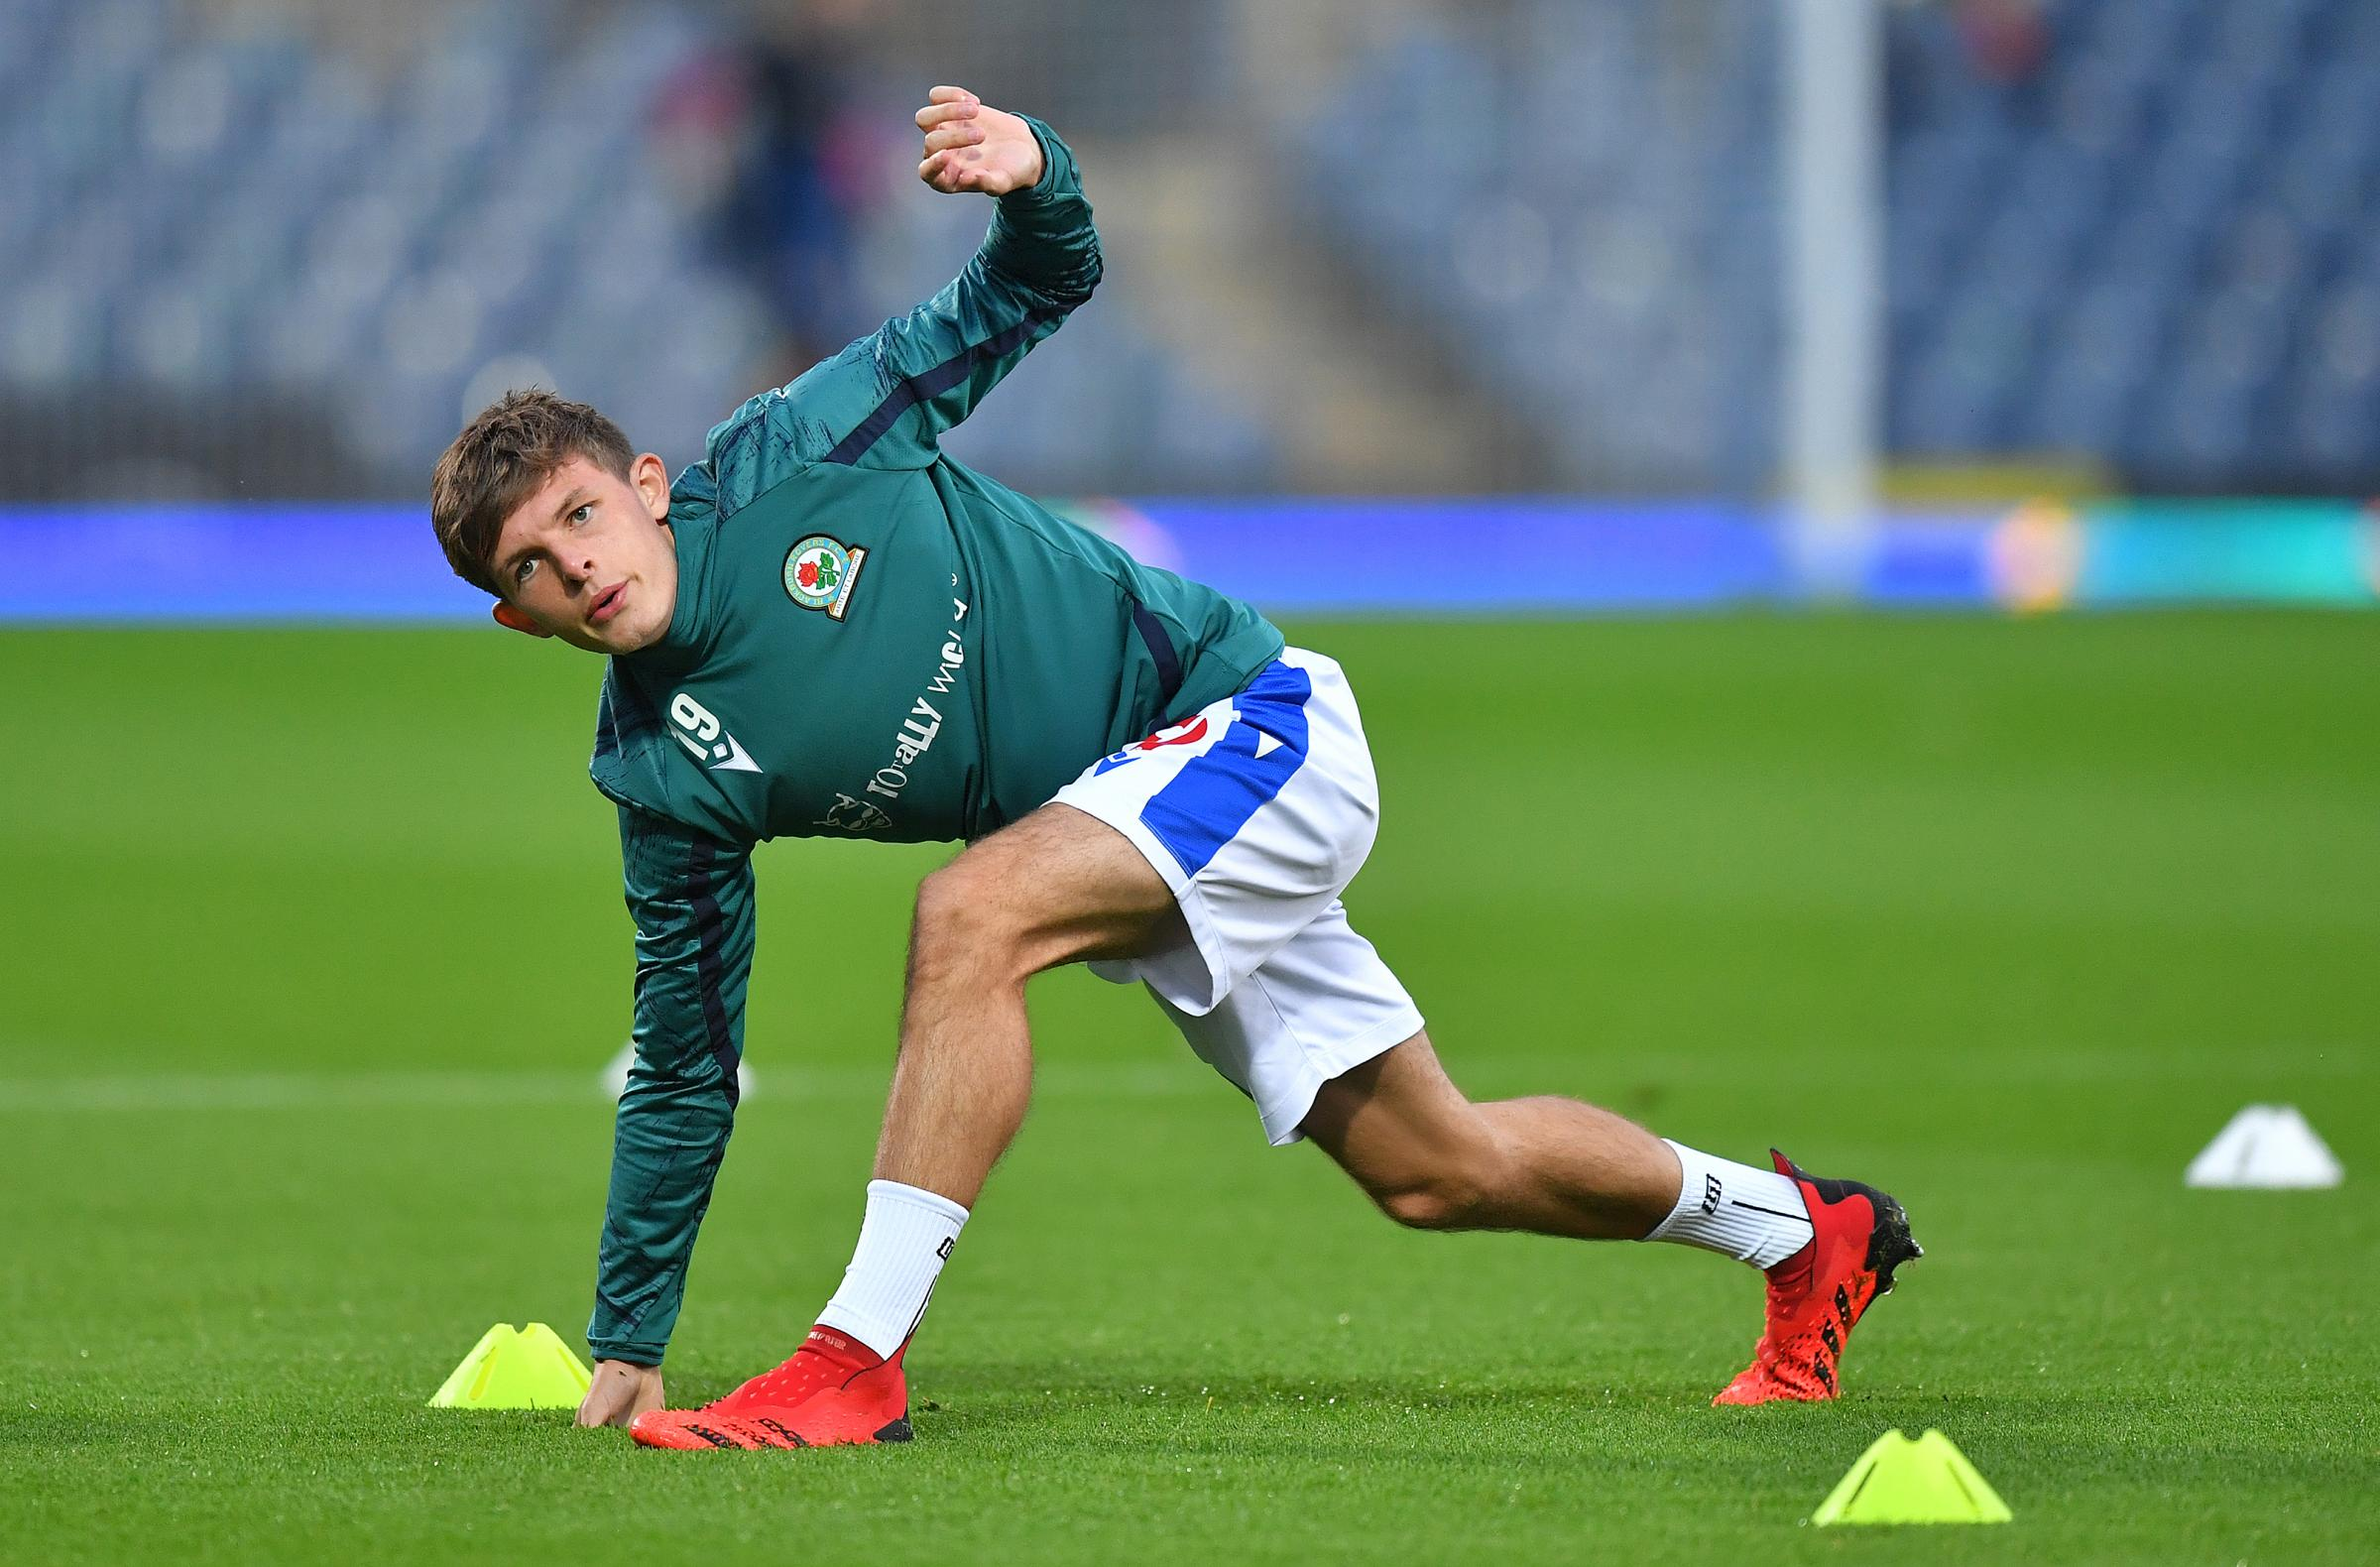 Liverpool volverá a Blackburn Rovers después de la salida de Inglaterra Sub-20